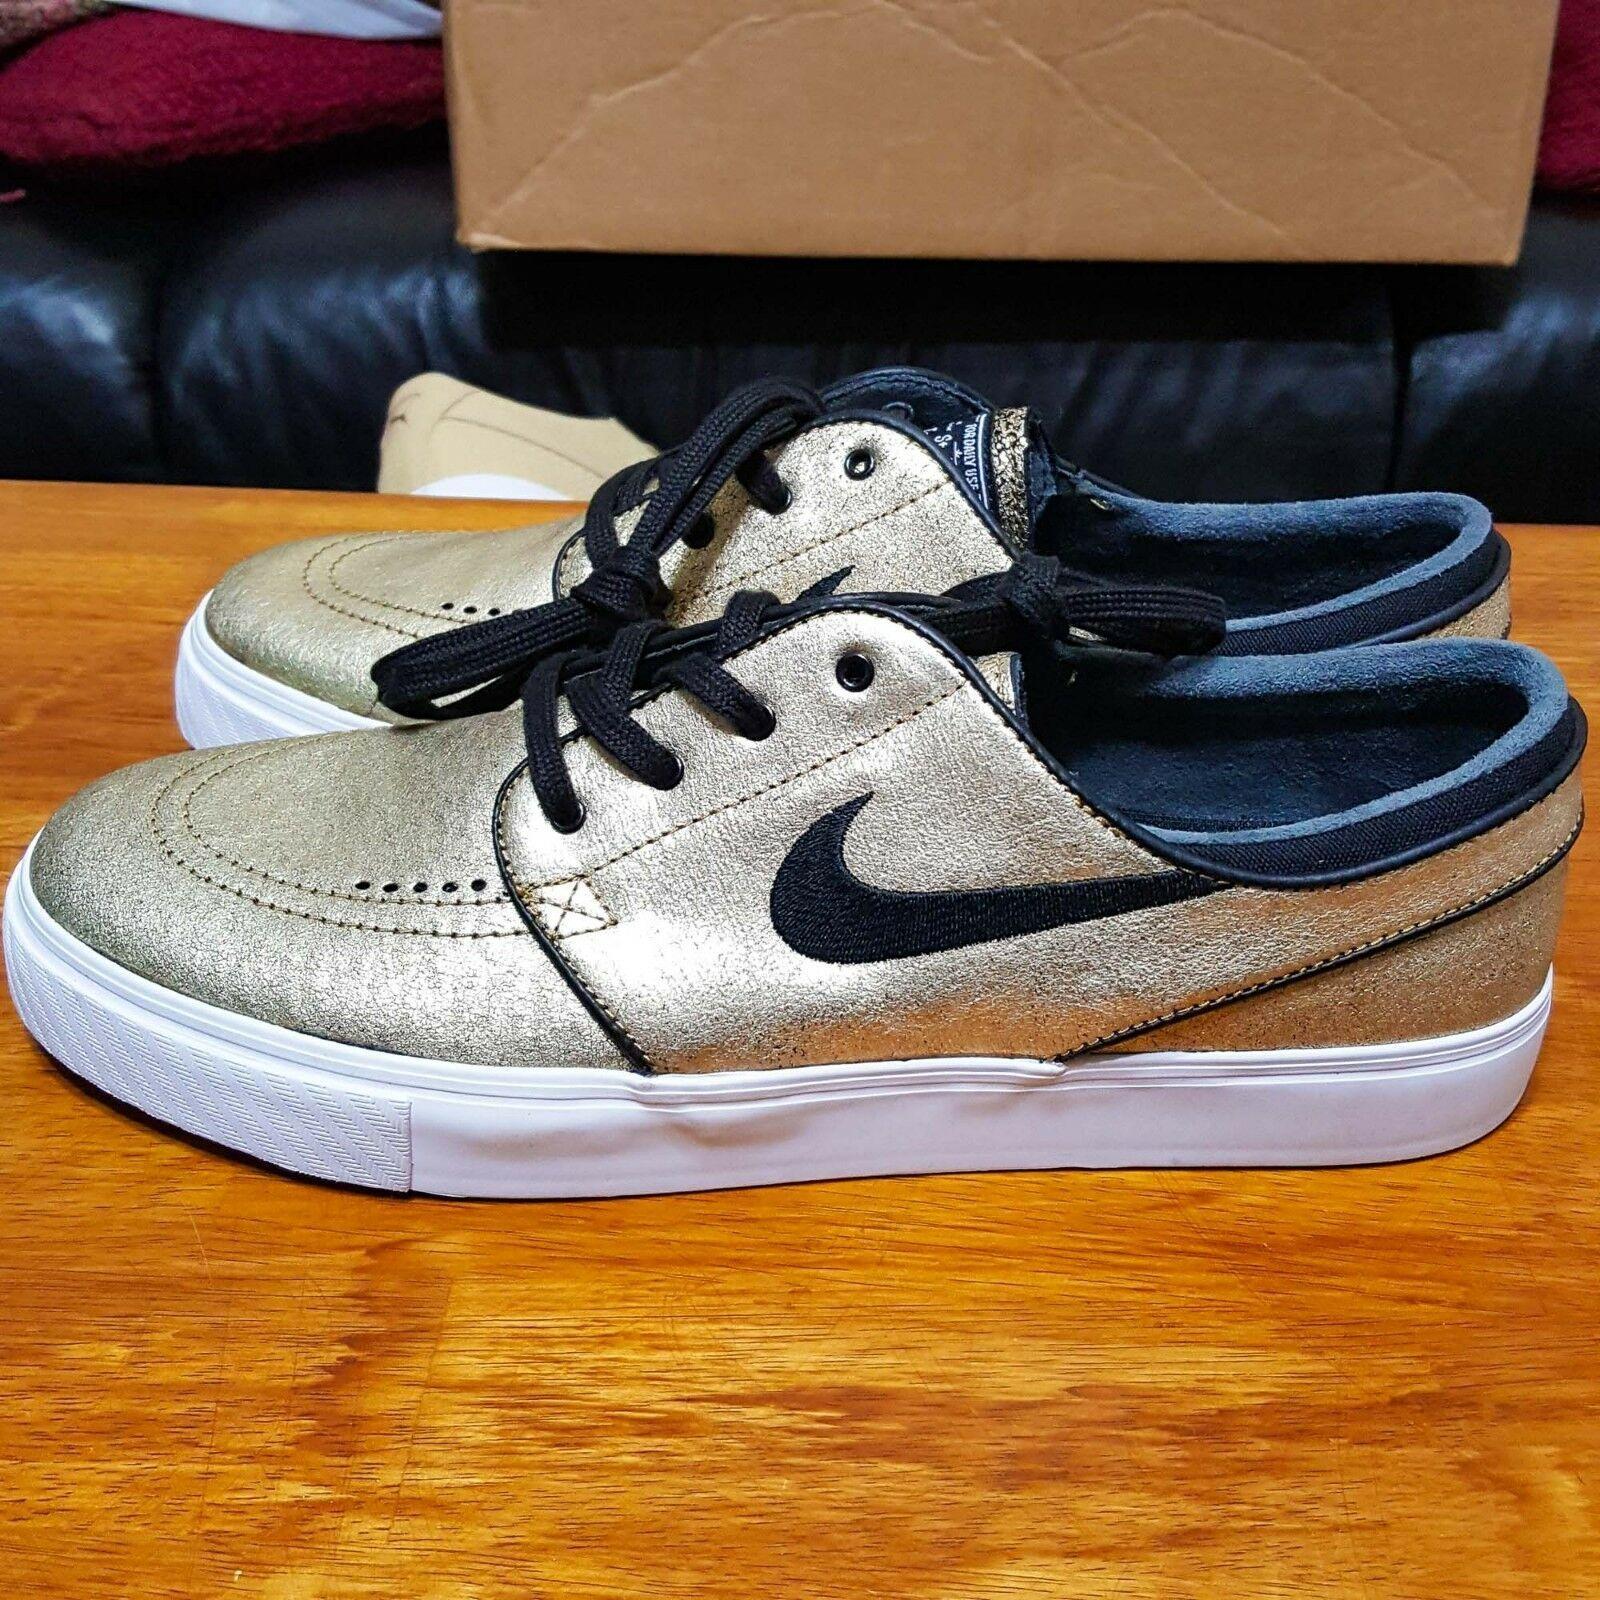 new concept a3275 21fd4 Nike Sb Zoom Stefan Janoski L pelle Oro 616490-702 USA 11.5, Eu 45.5